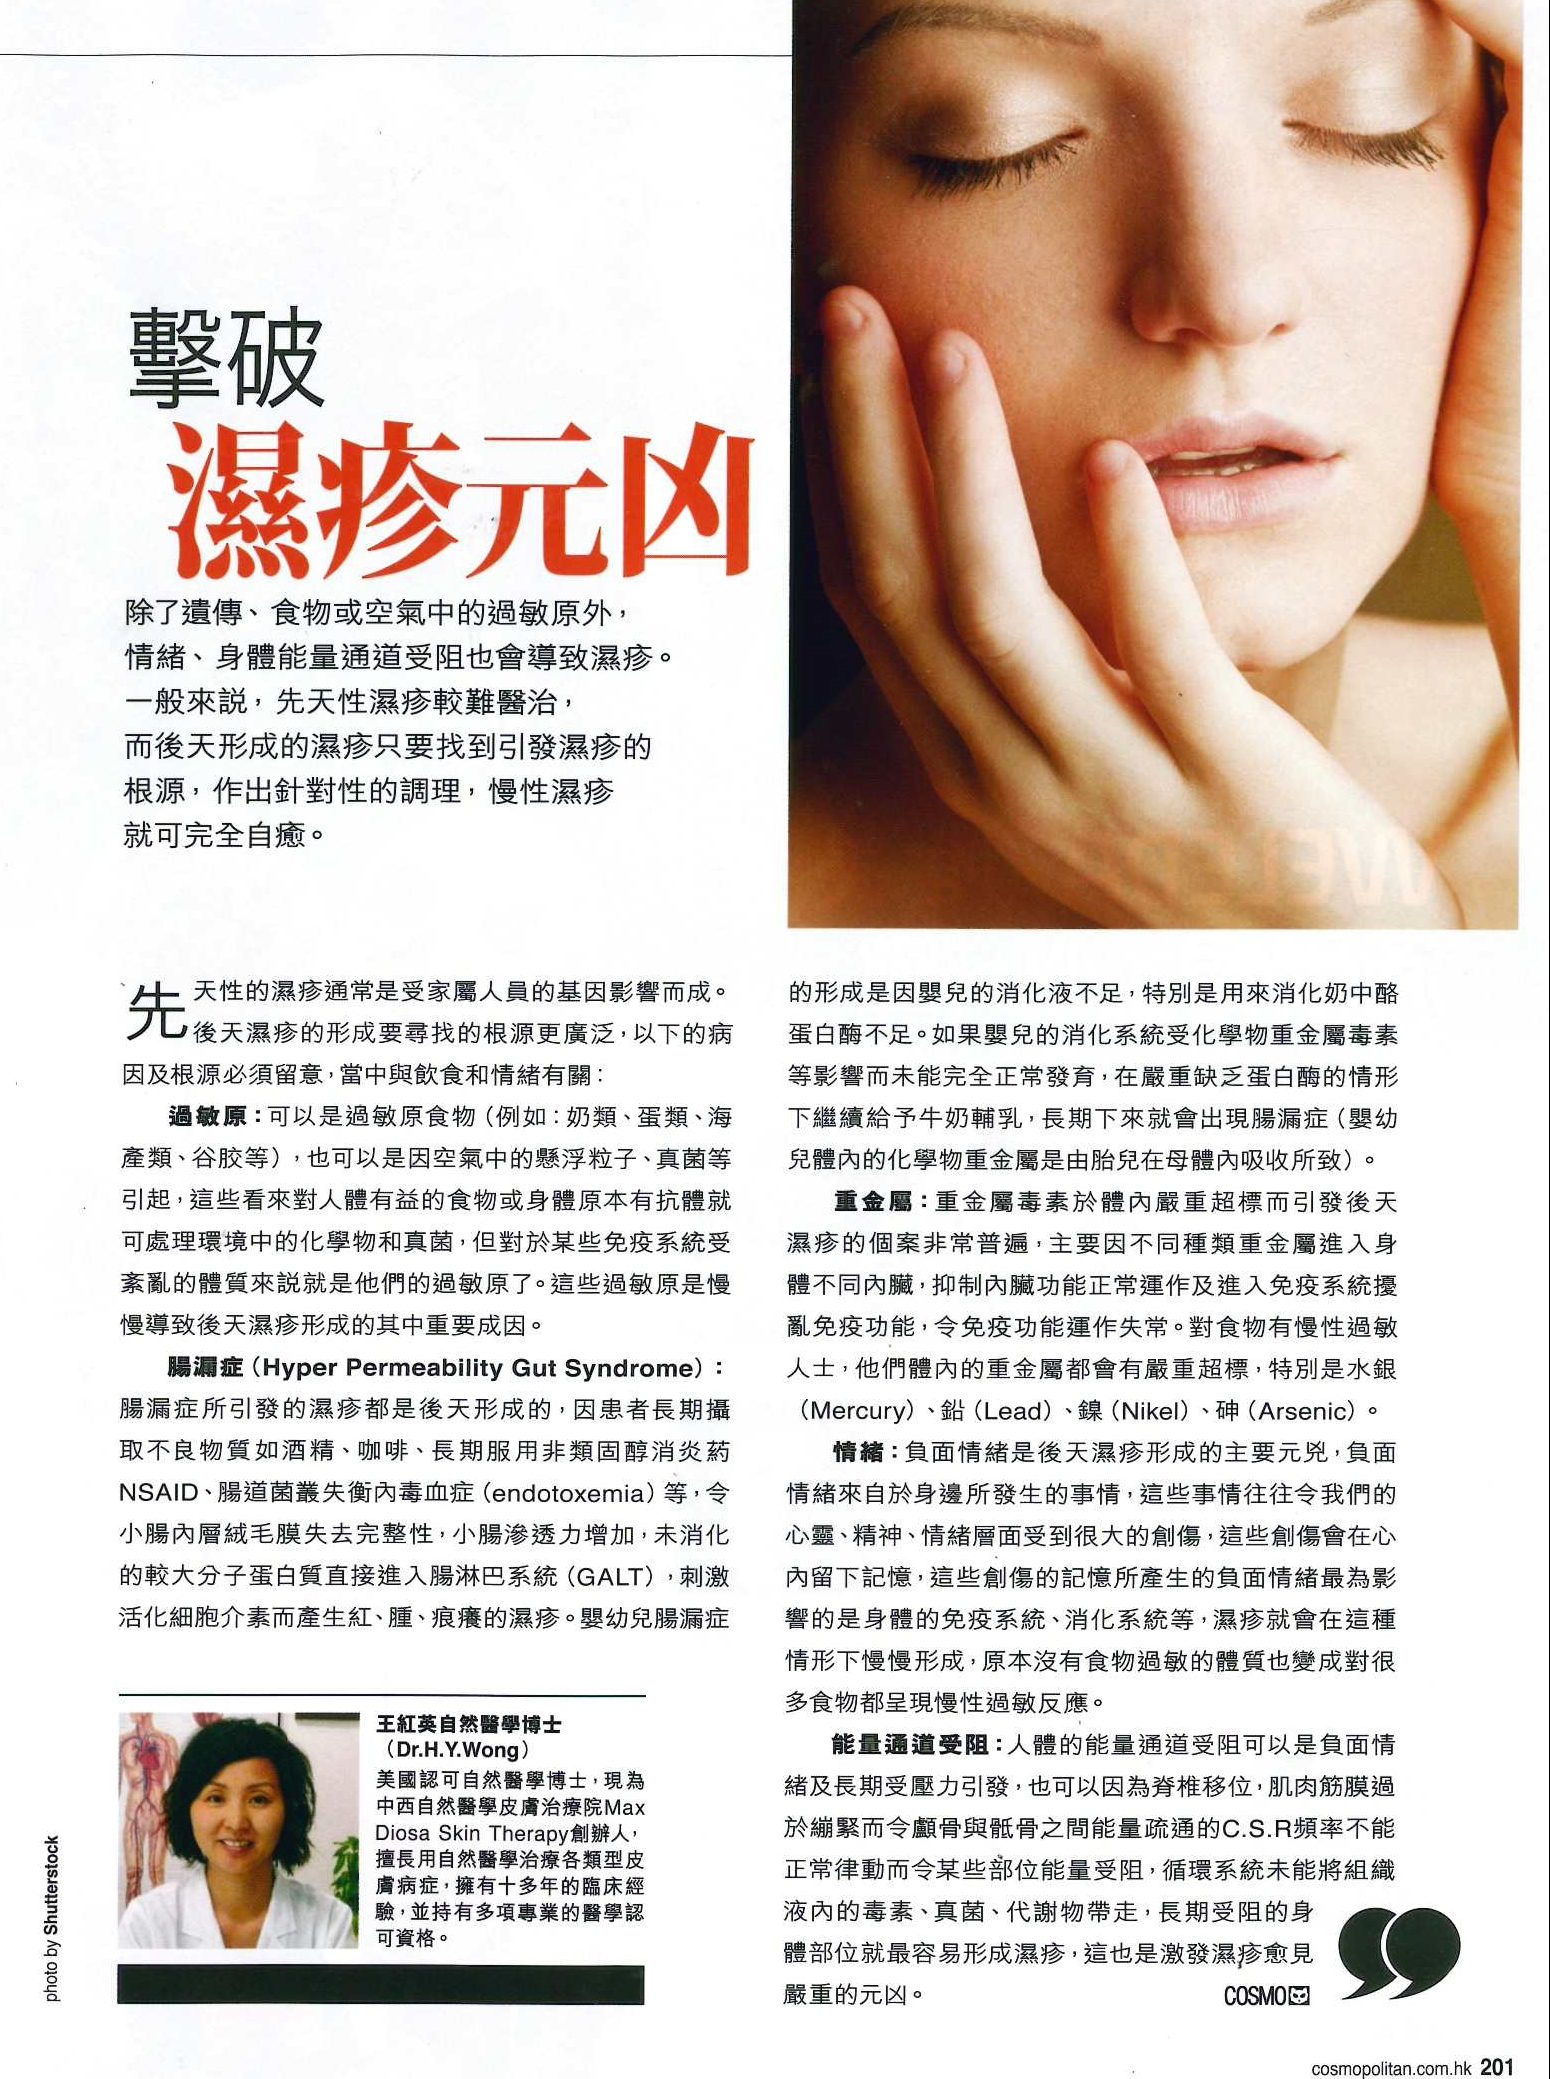 2014年6月Cosmopolitan 擊破濕疹元凶(2)